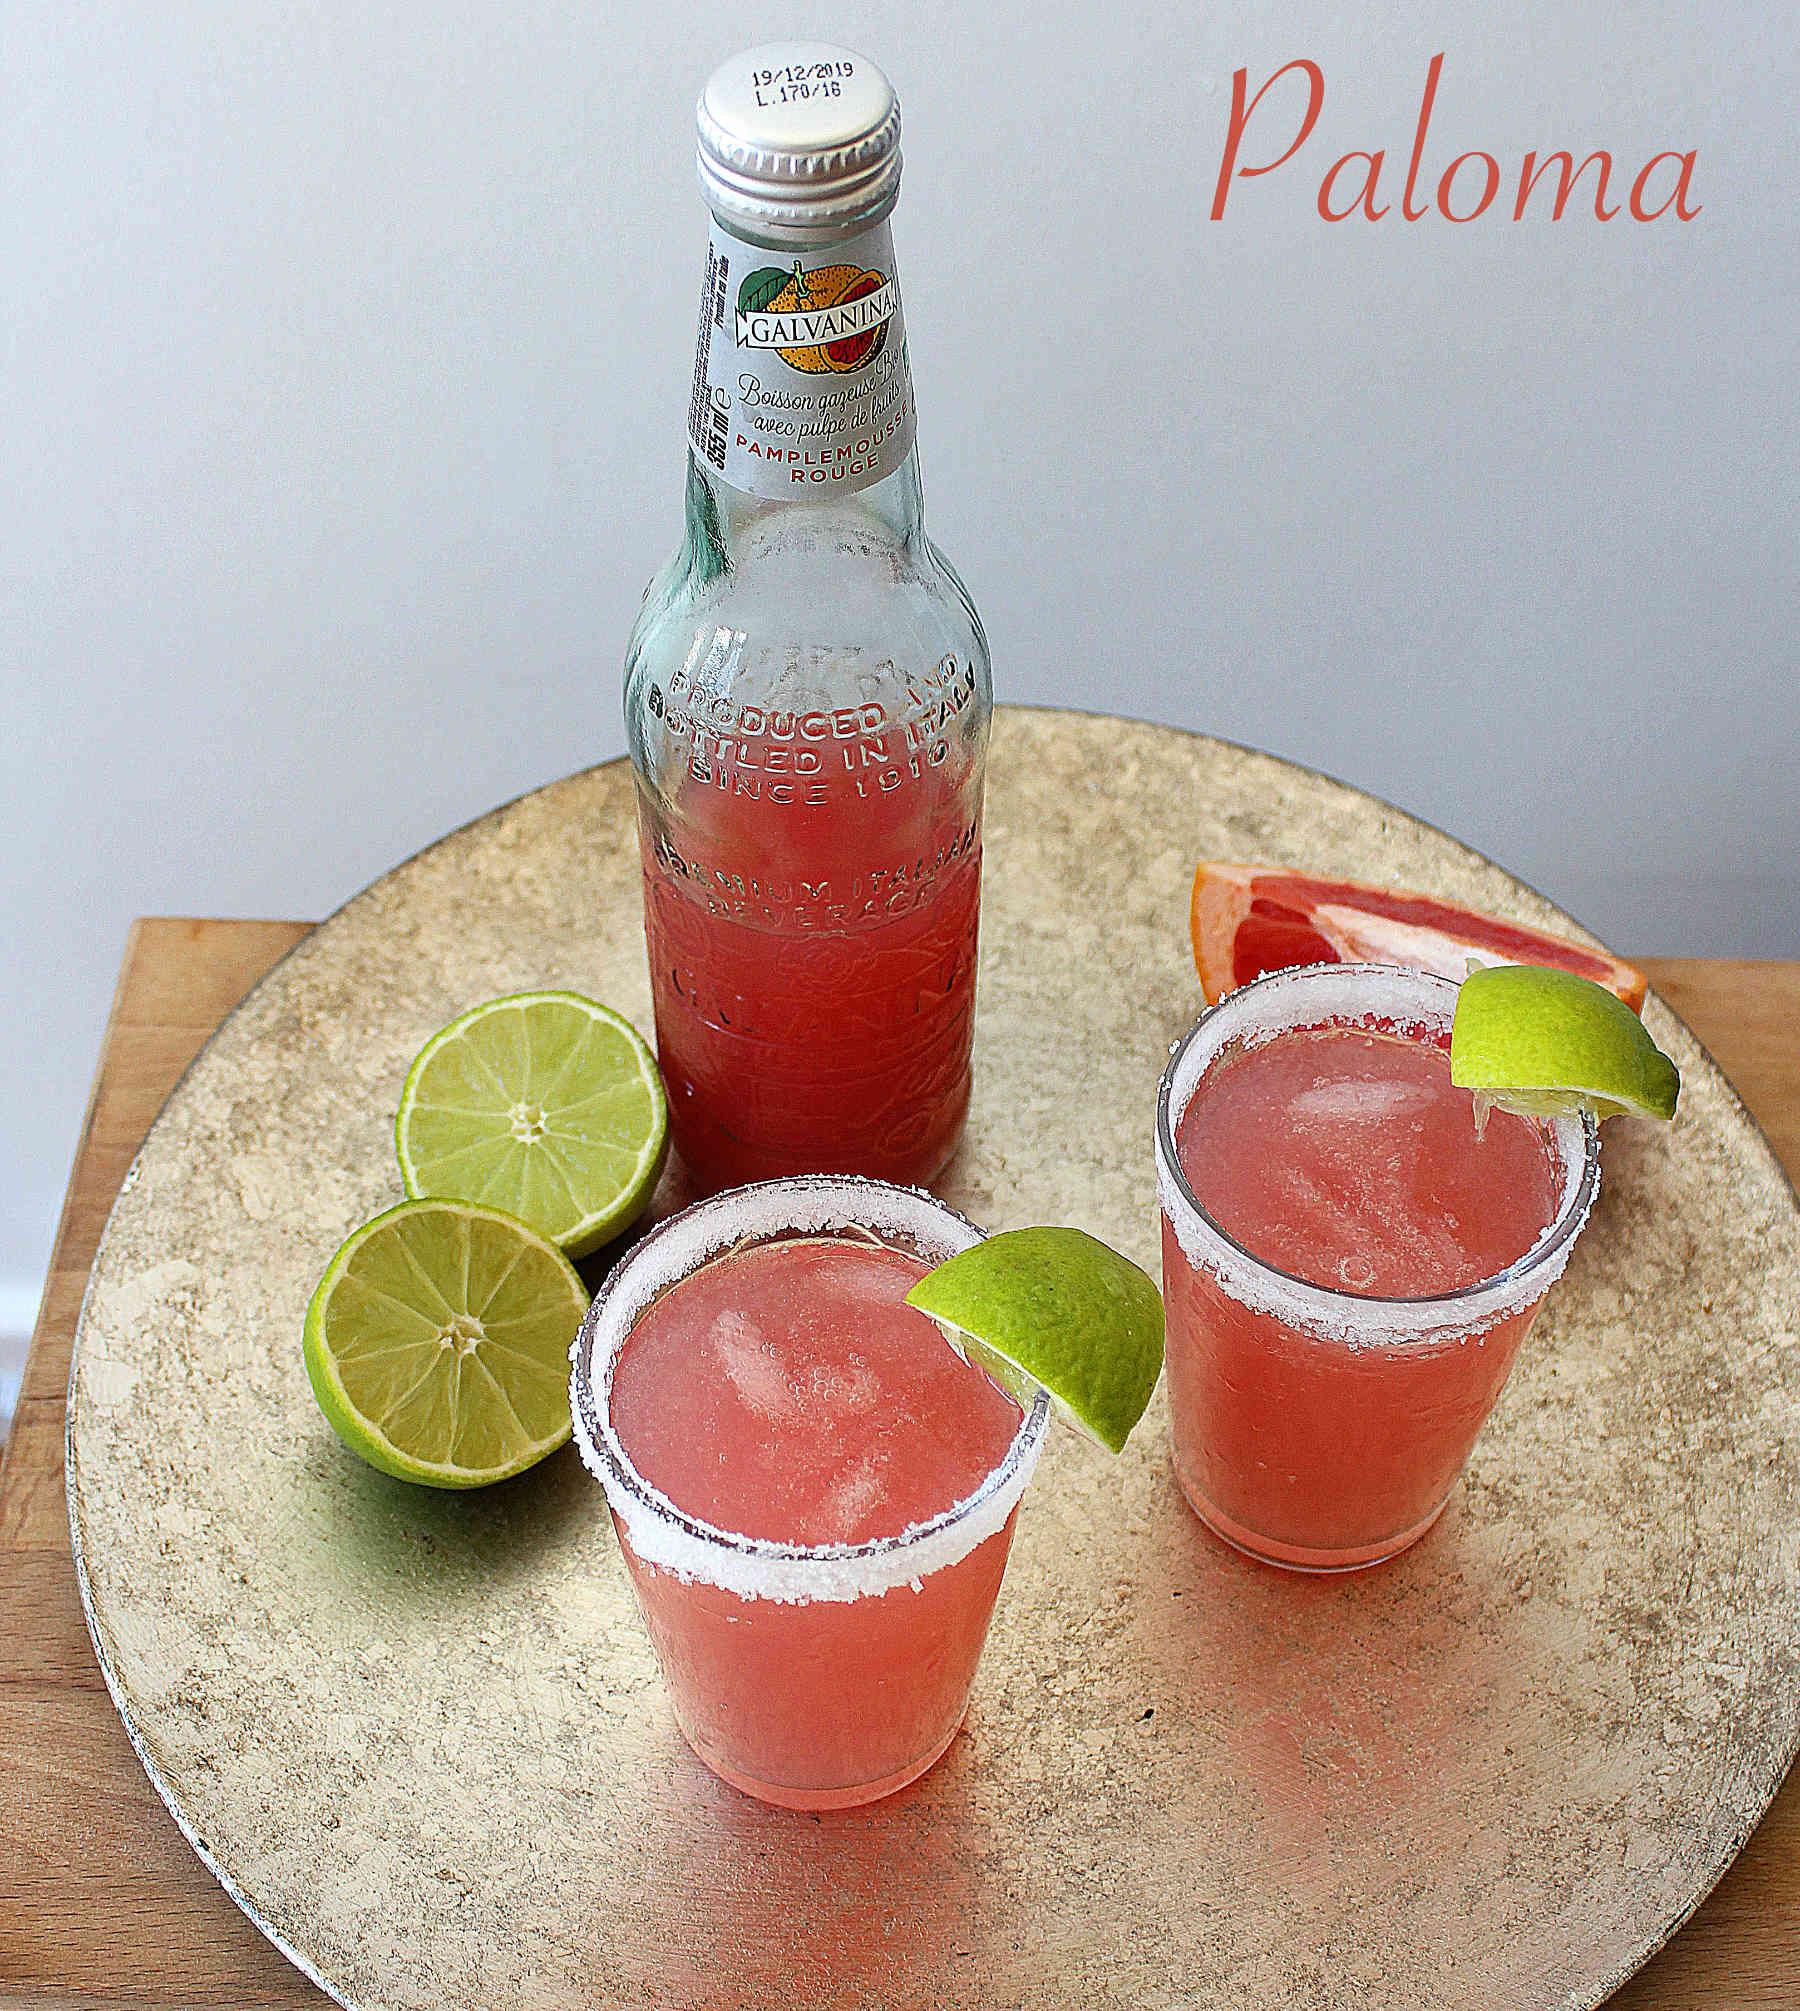 Paloma cocktails with Galvanina